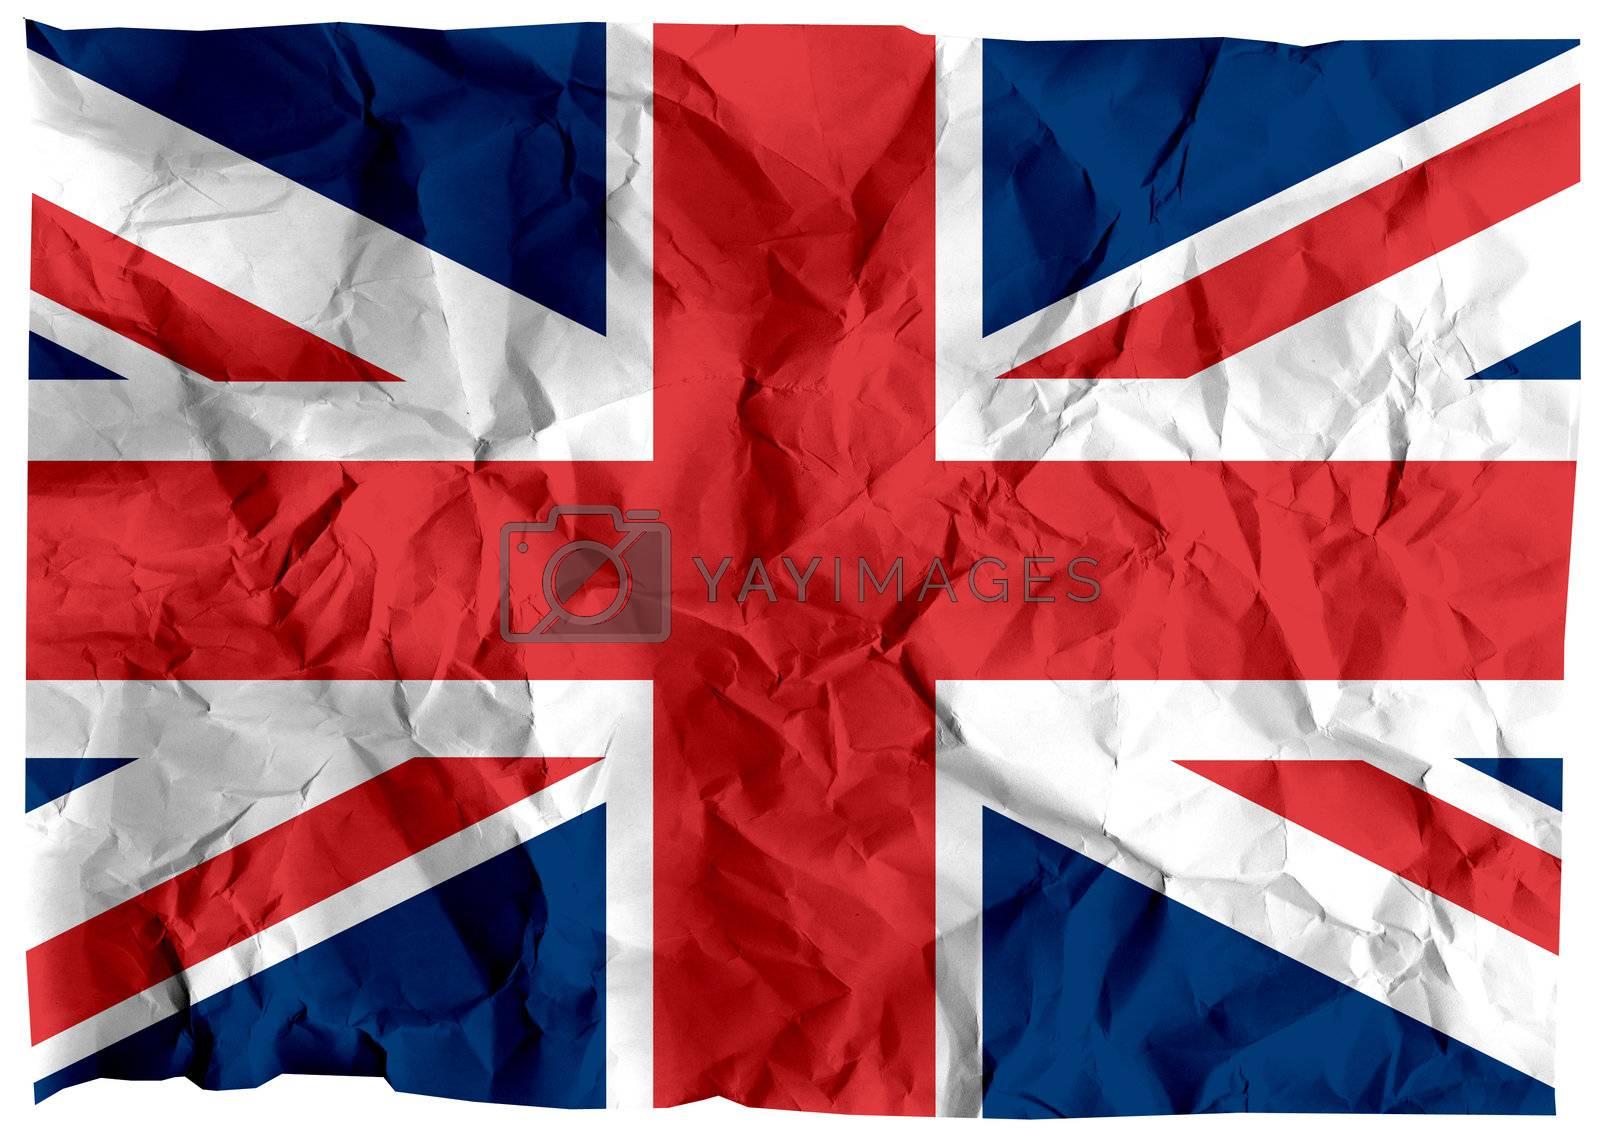 The national flag of United Kingdom (Europe).